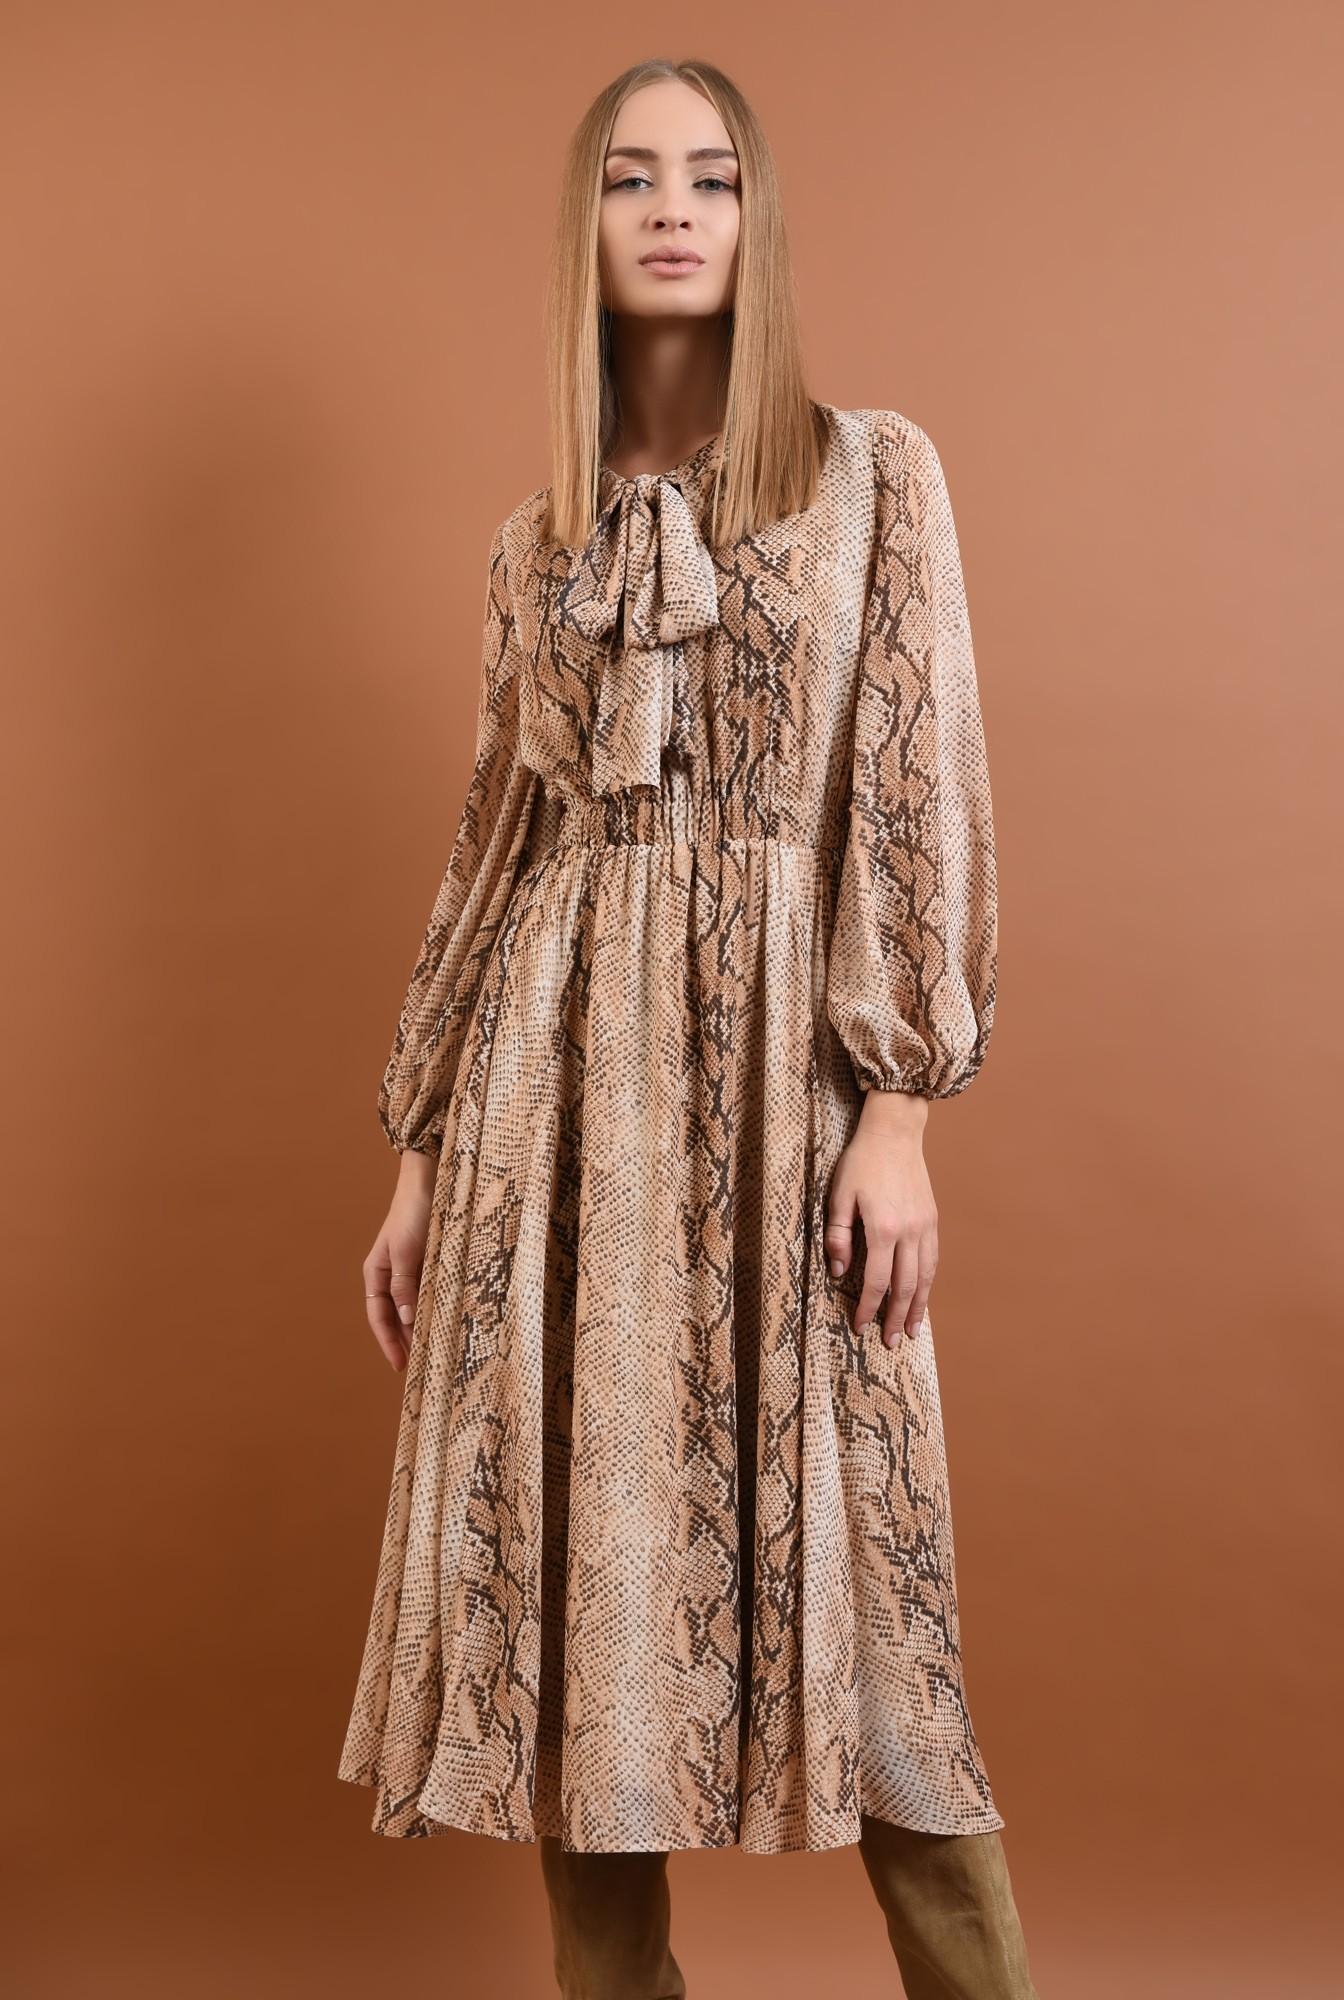 3 - 360 - rochie eleganta, de zi, din voal, imprimata, sarpe, maneci lungi, esarfa